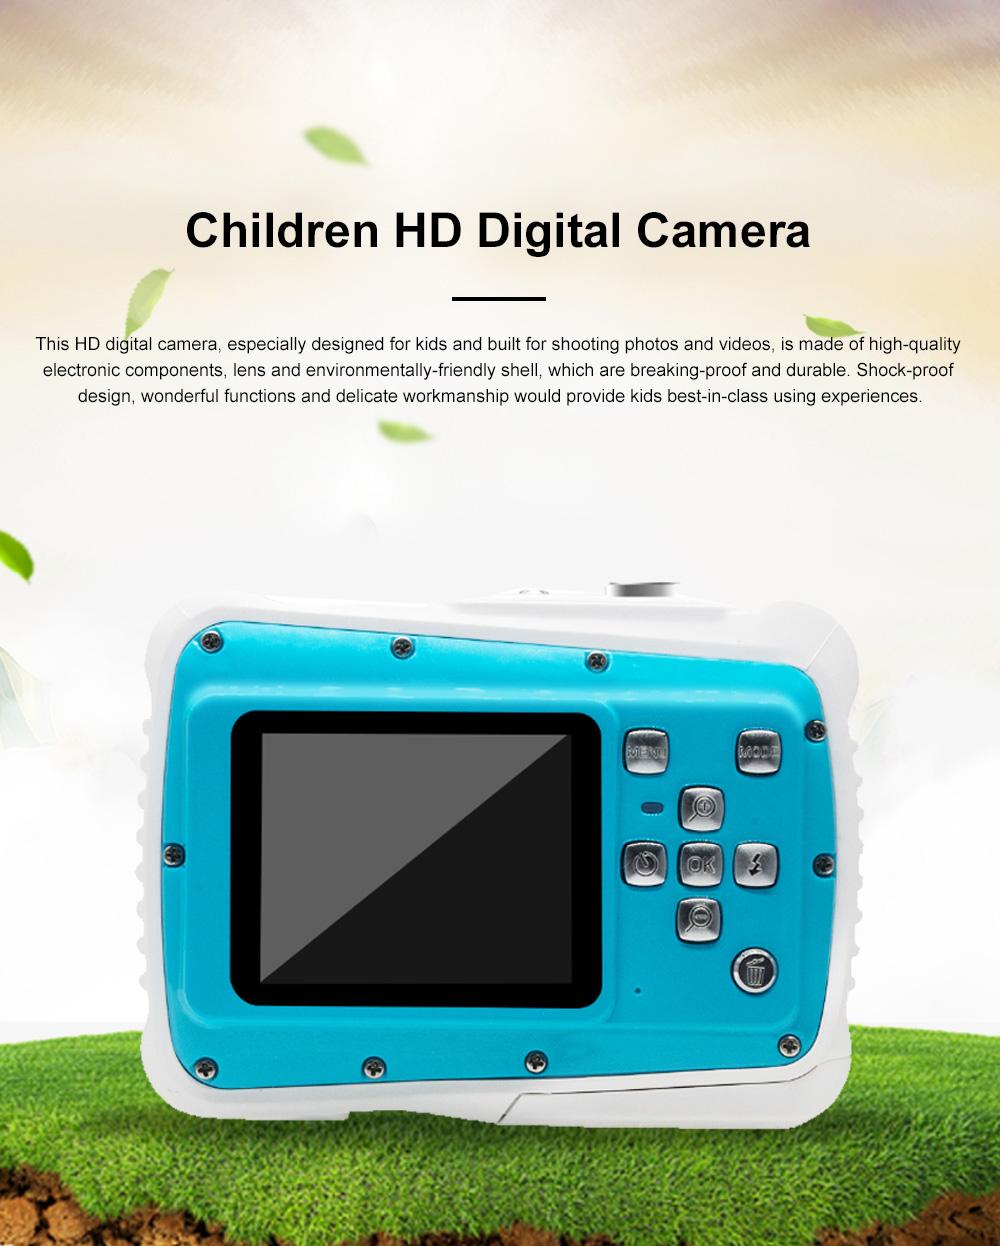 Delicate Portable Breaking-proof 3M Waterproof Children HD Digital Camera 21 Million Pixels Cam for Kids 0